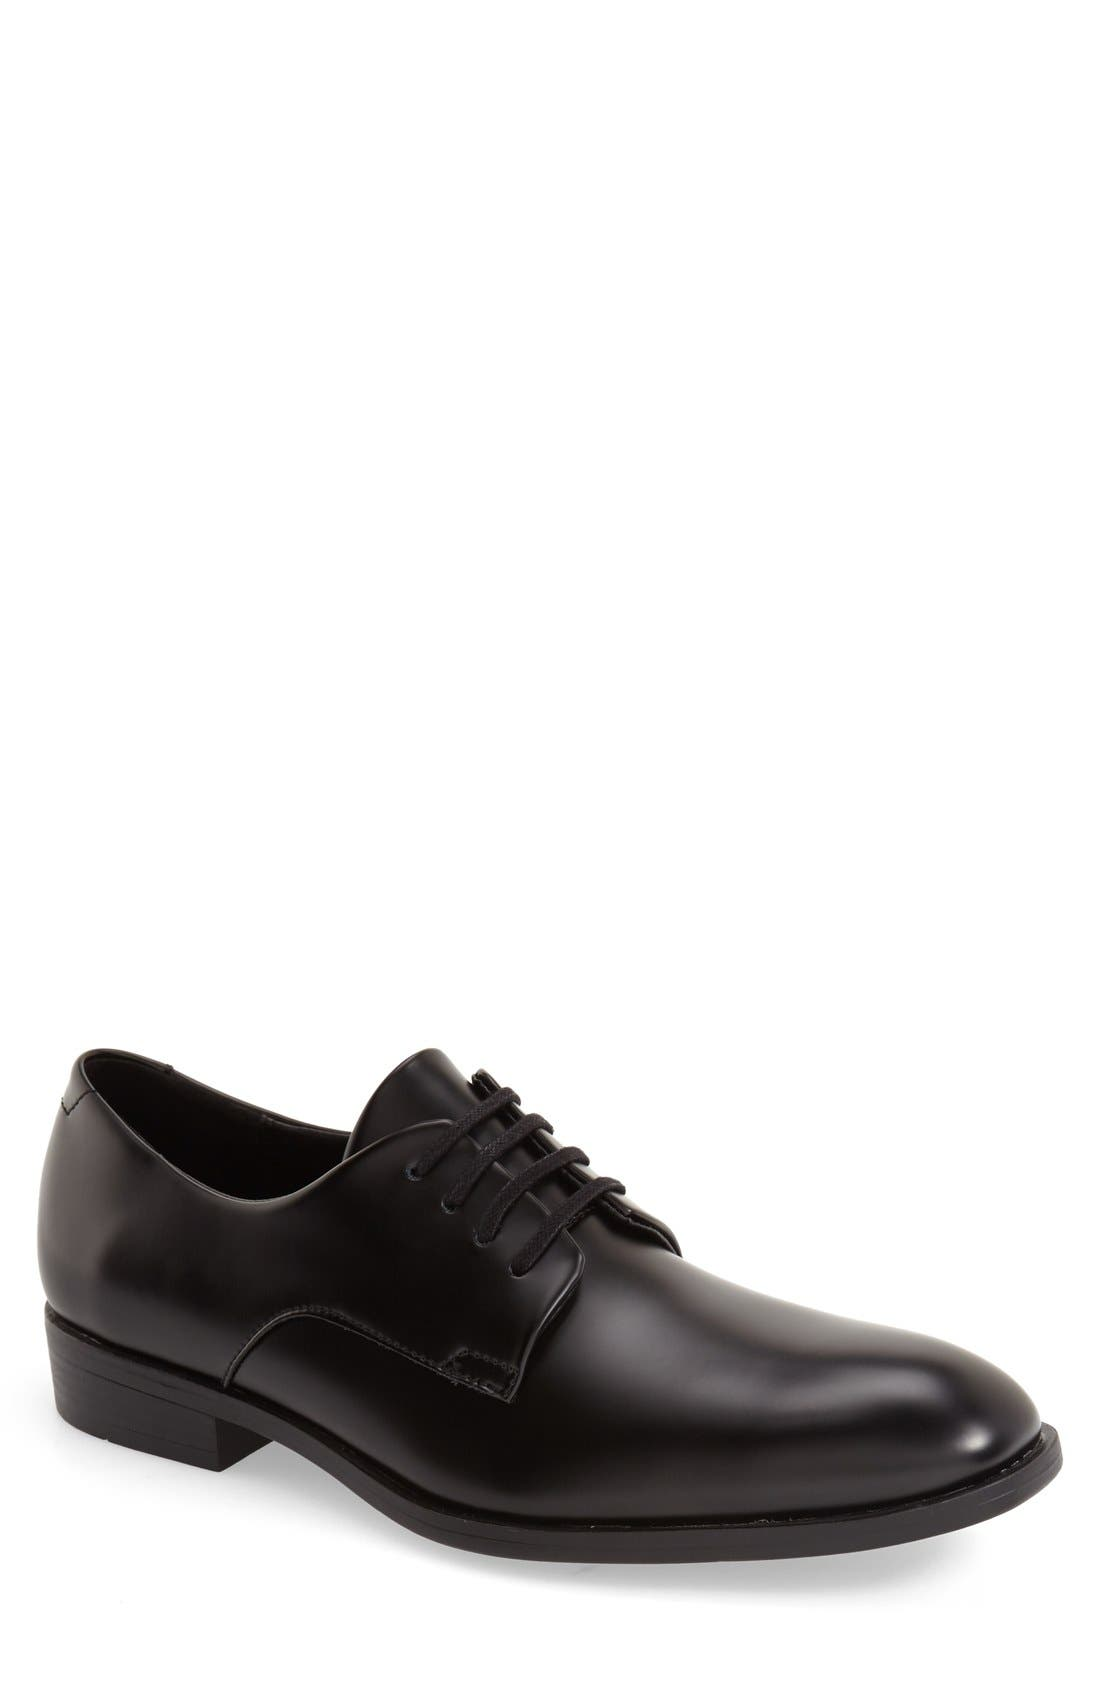 'Dorrel' Plain Toe Derby,                         Main,                         color, Black